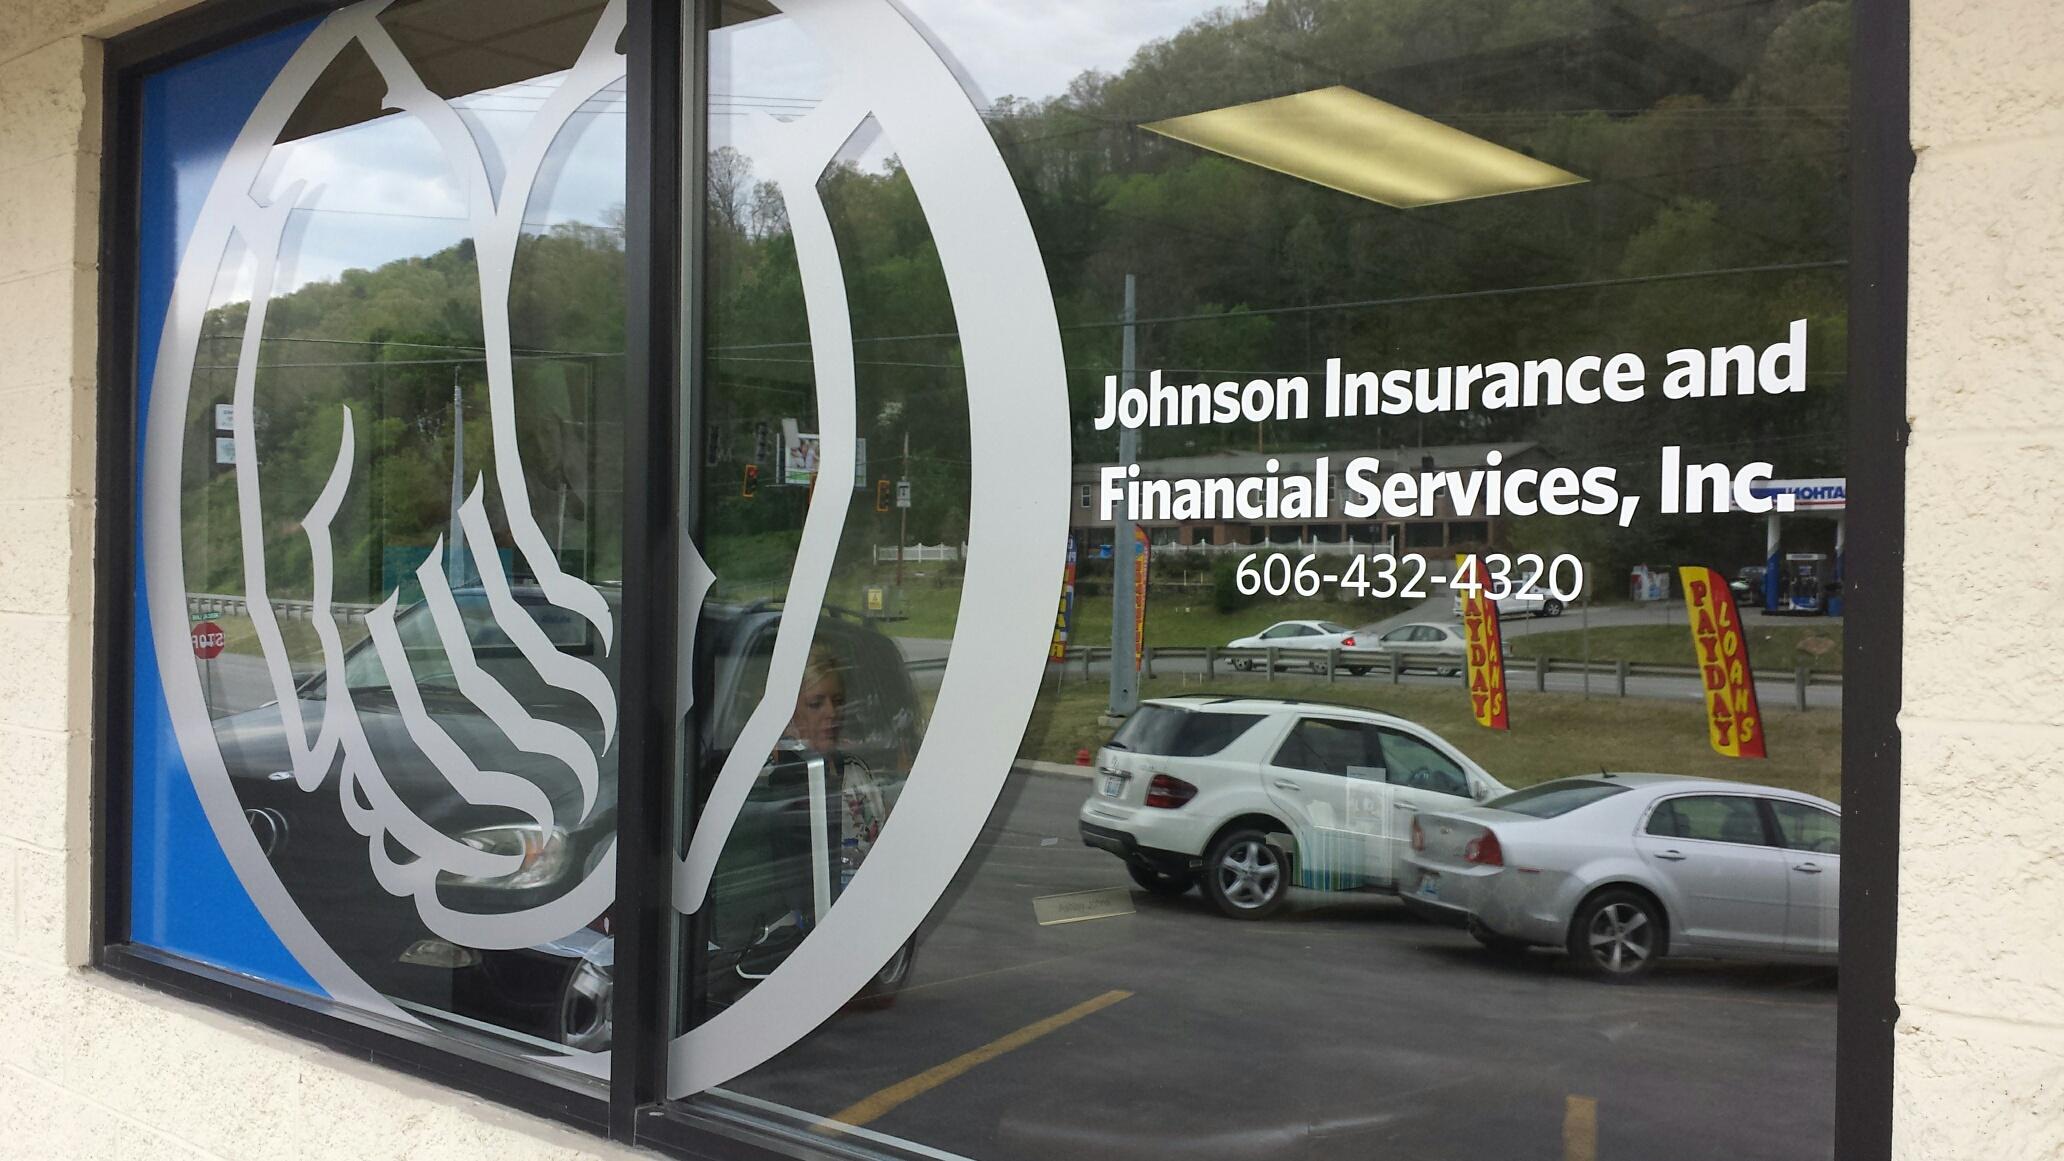 Melissa Crowdus: Allstate Insurance image 2